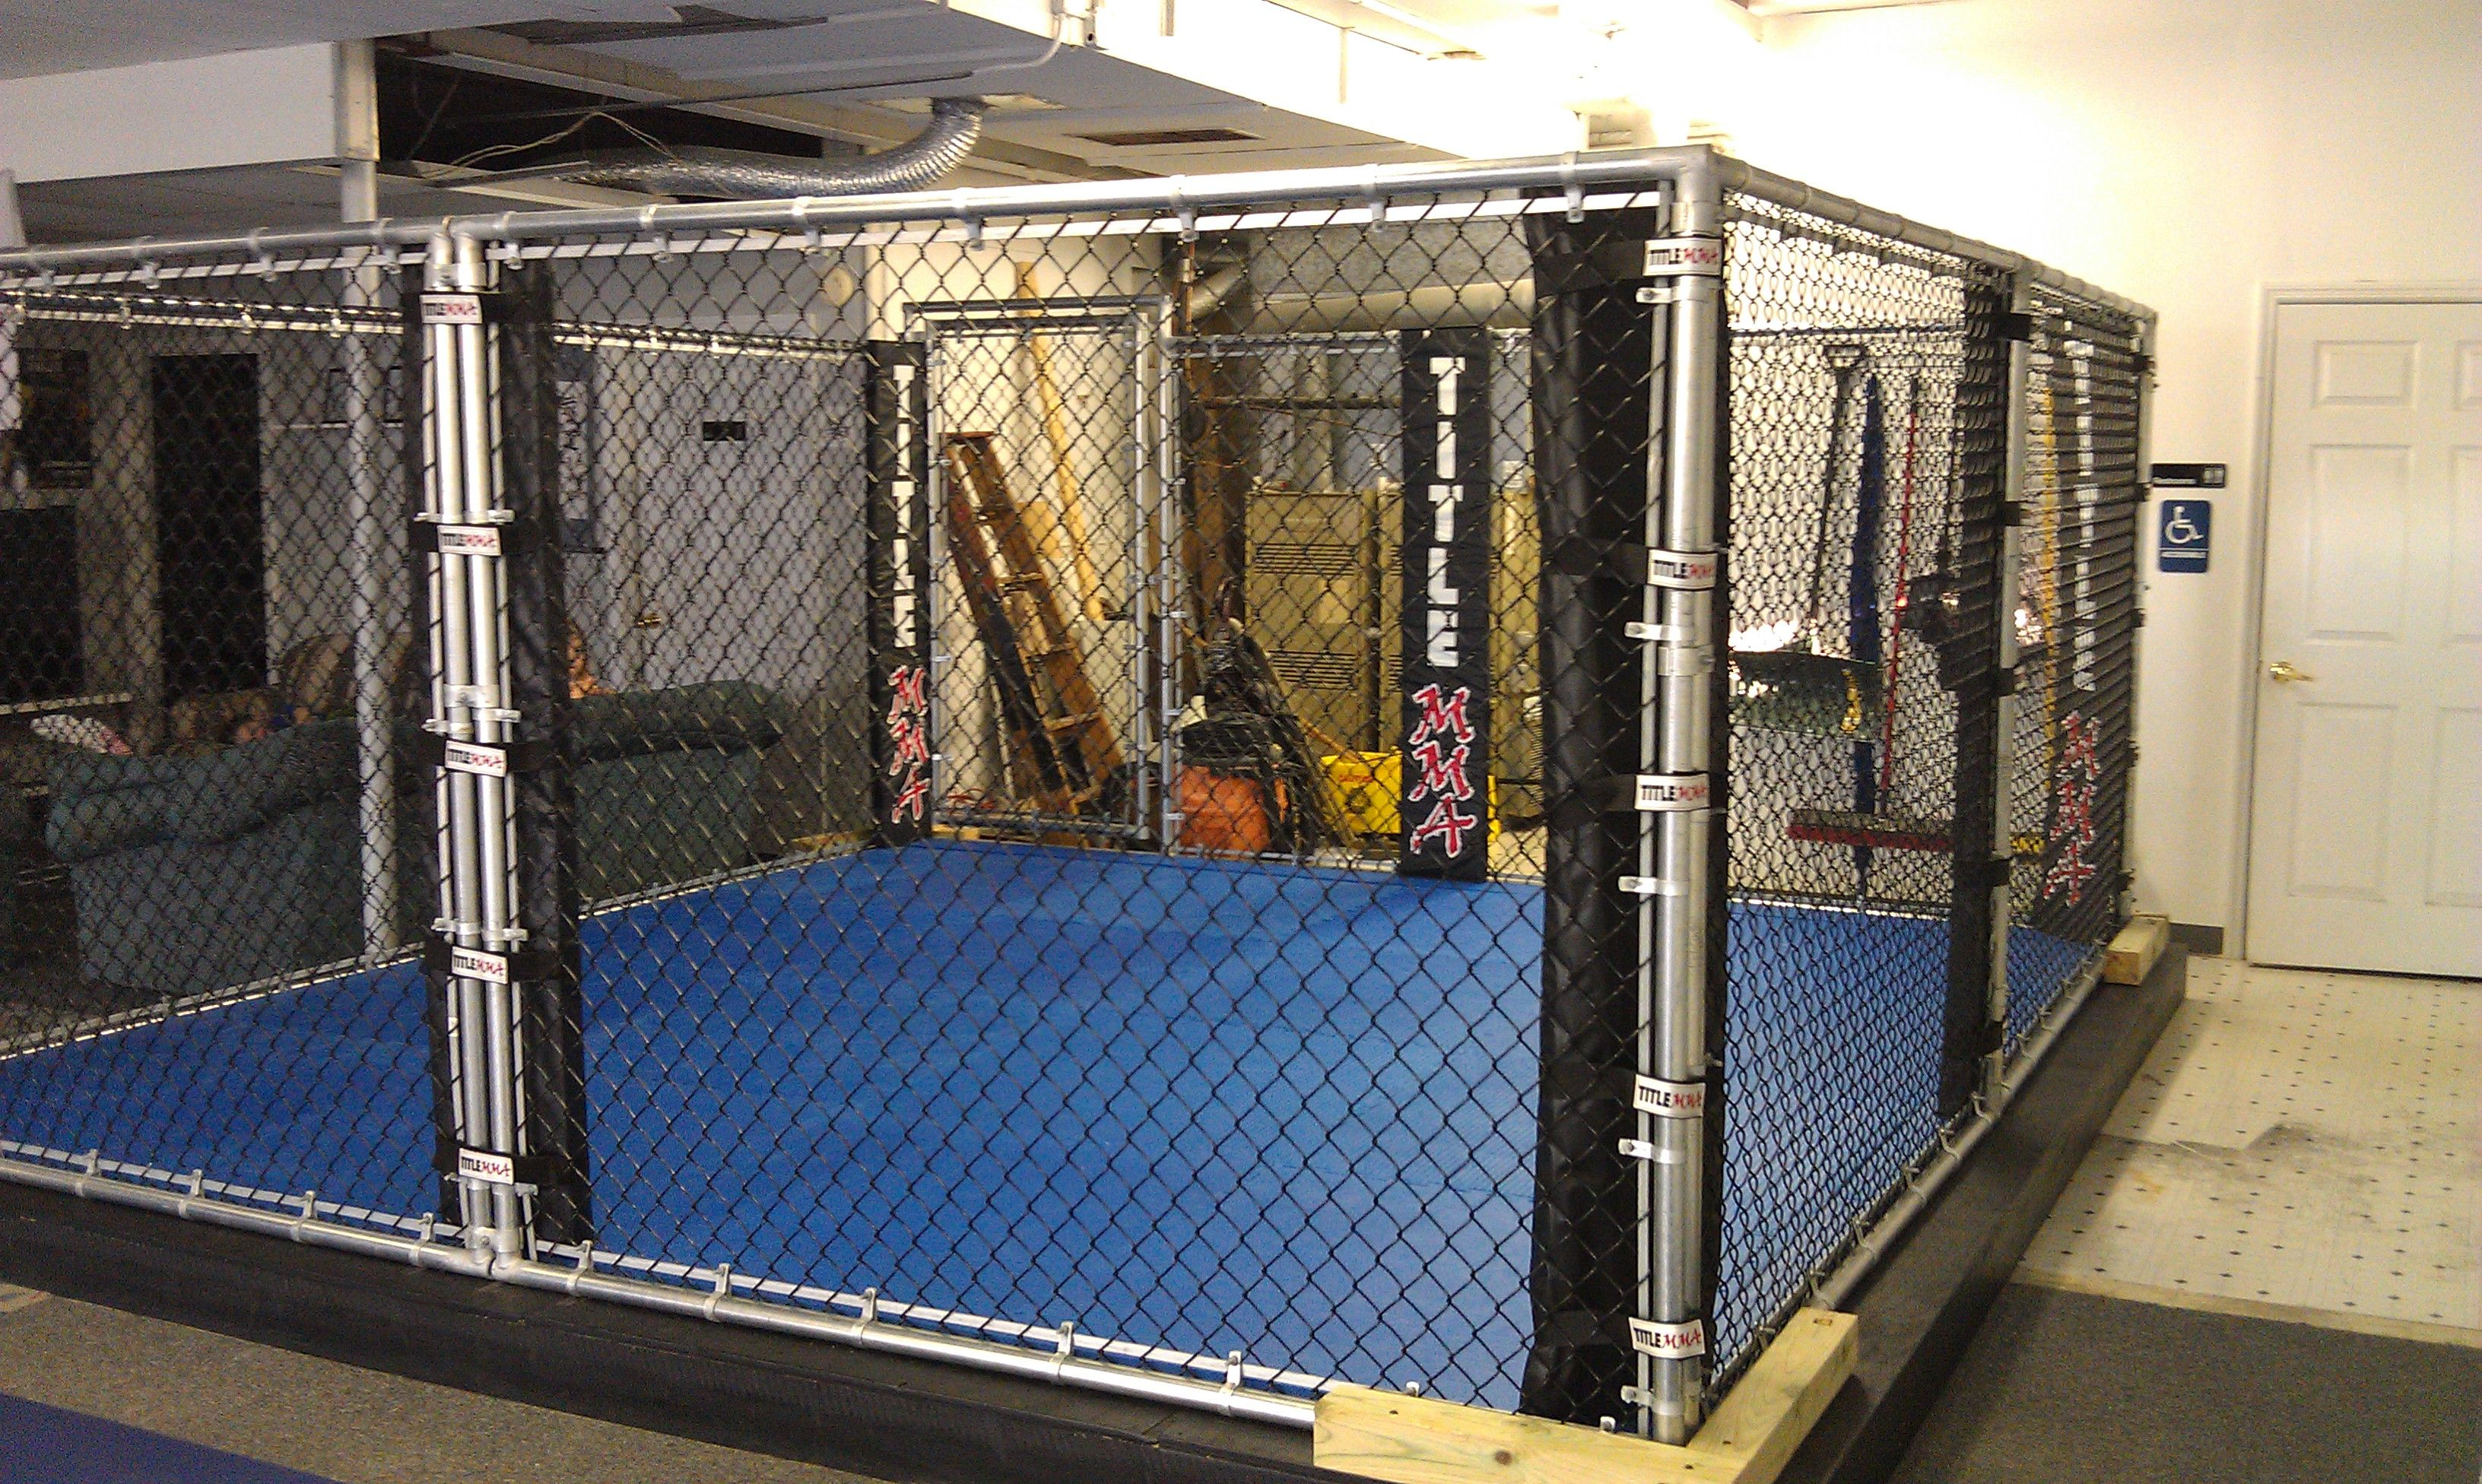 Bjj Lifestyle Academy Has A Brand New 15 15 Mma Cage Boxing Ring Bjj Mma Brazilian Jiu Jitsu